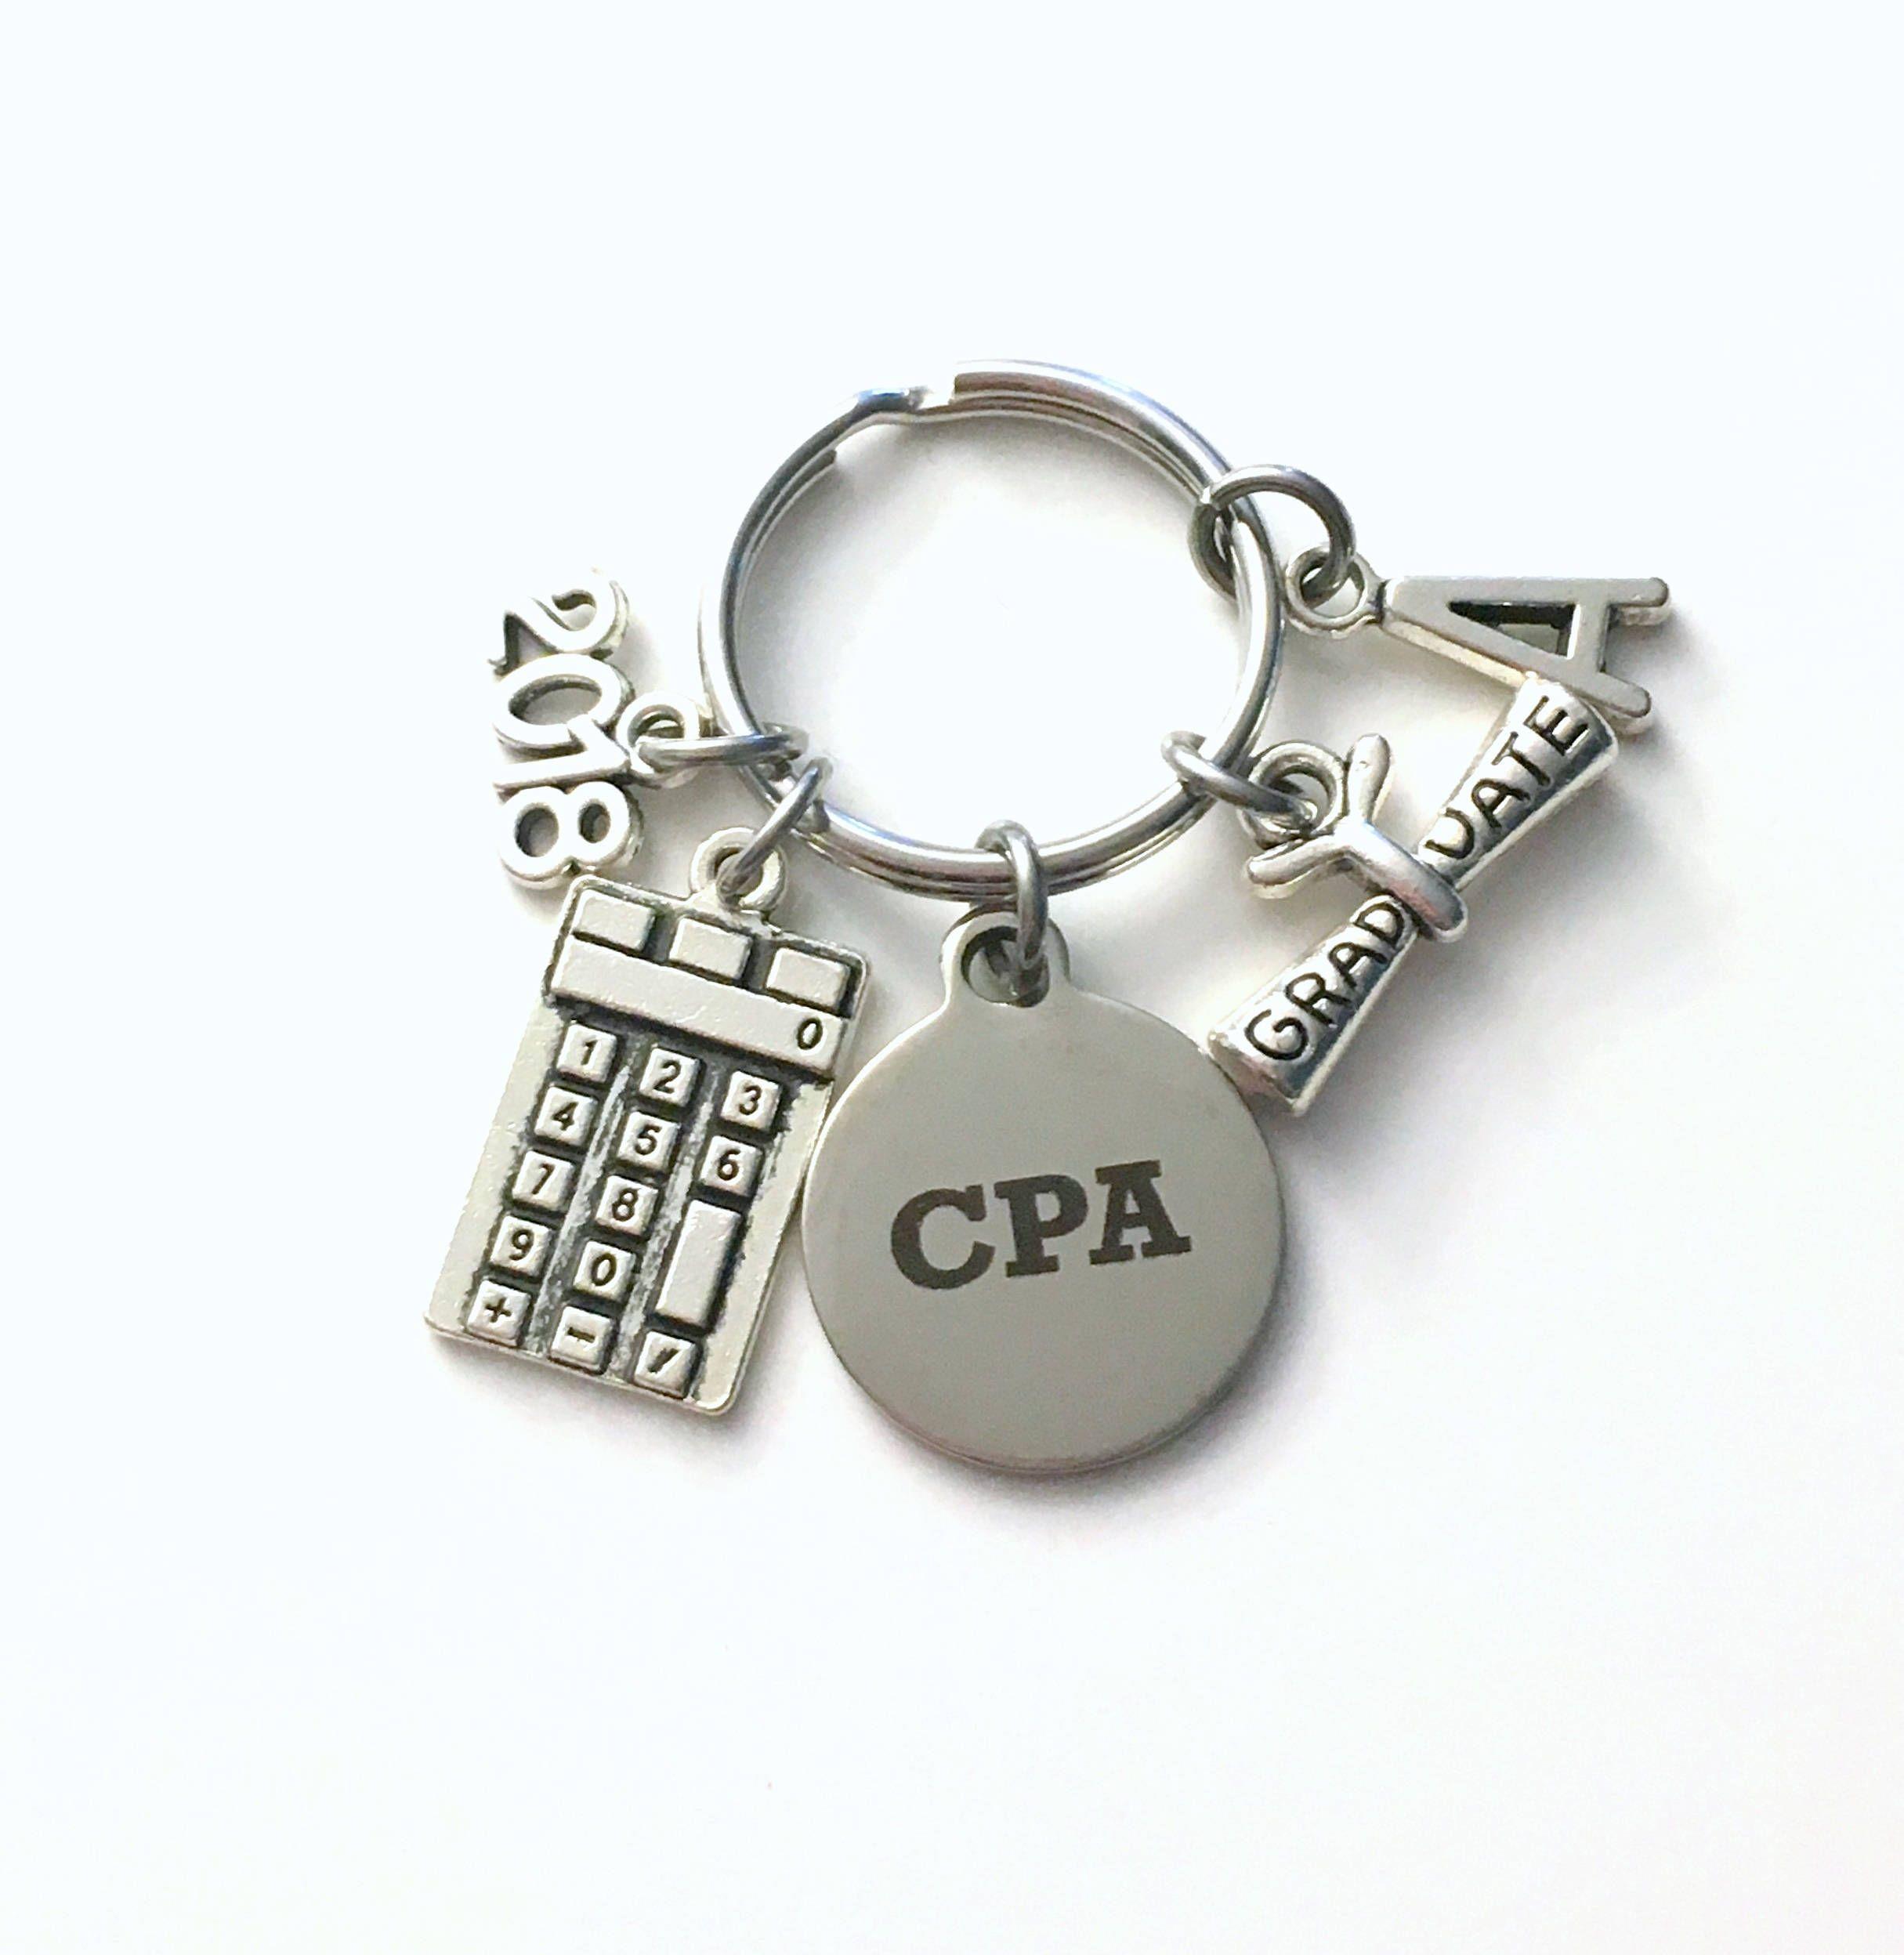 Cpa graduation key chain 2018 2017 chartered professional